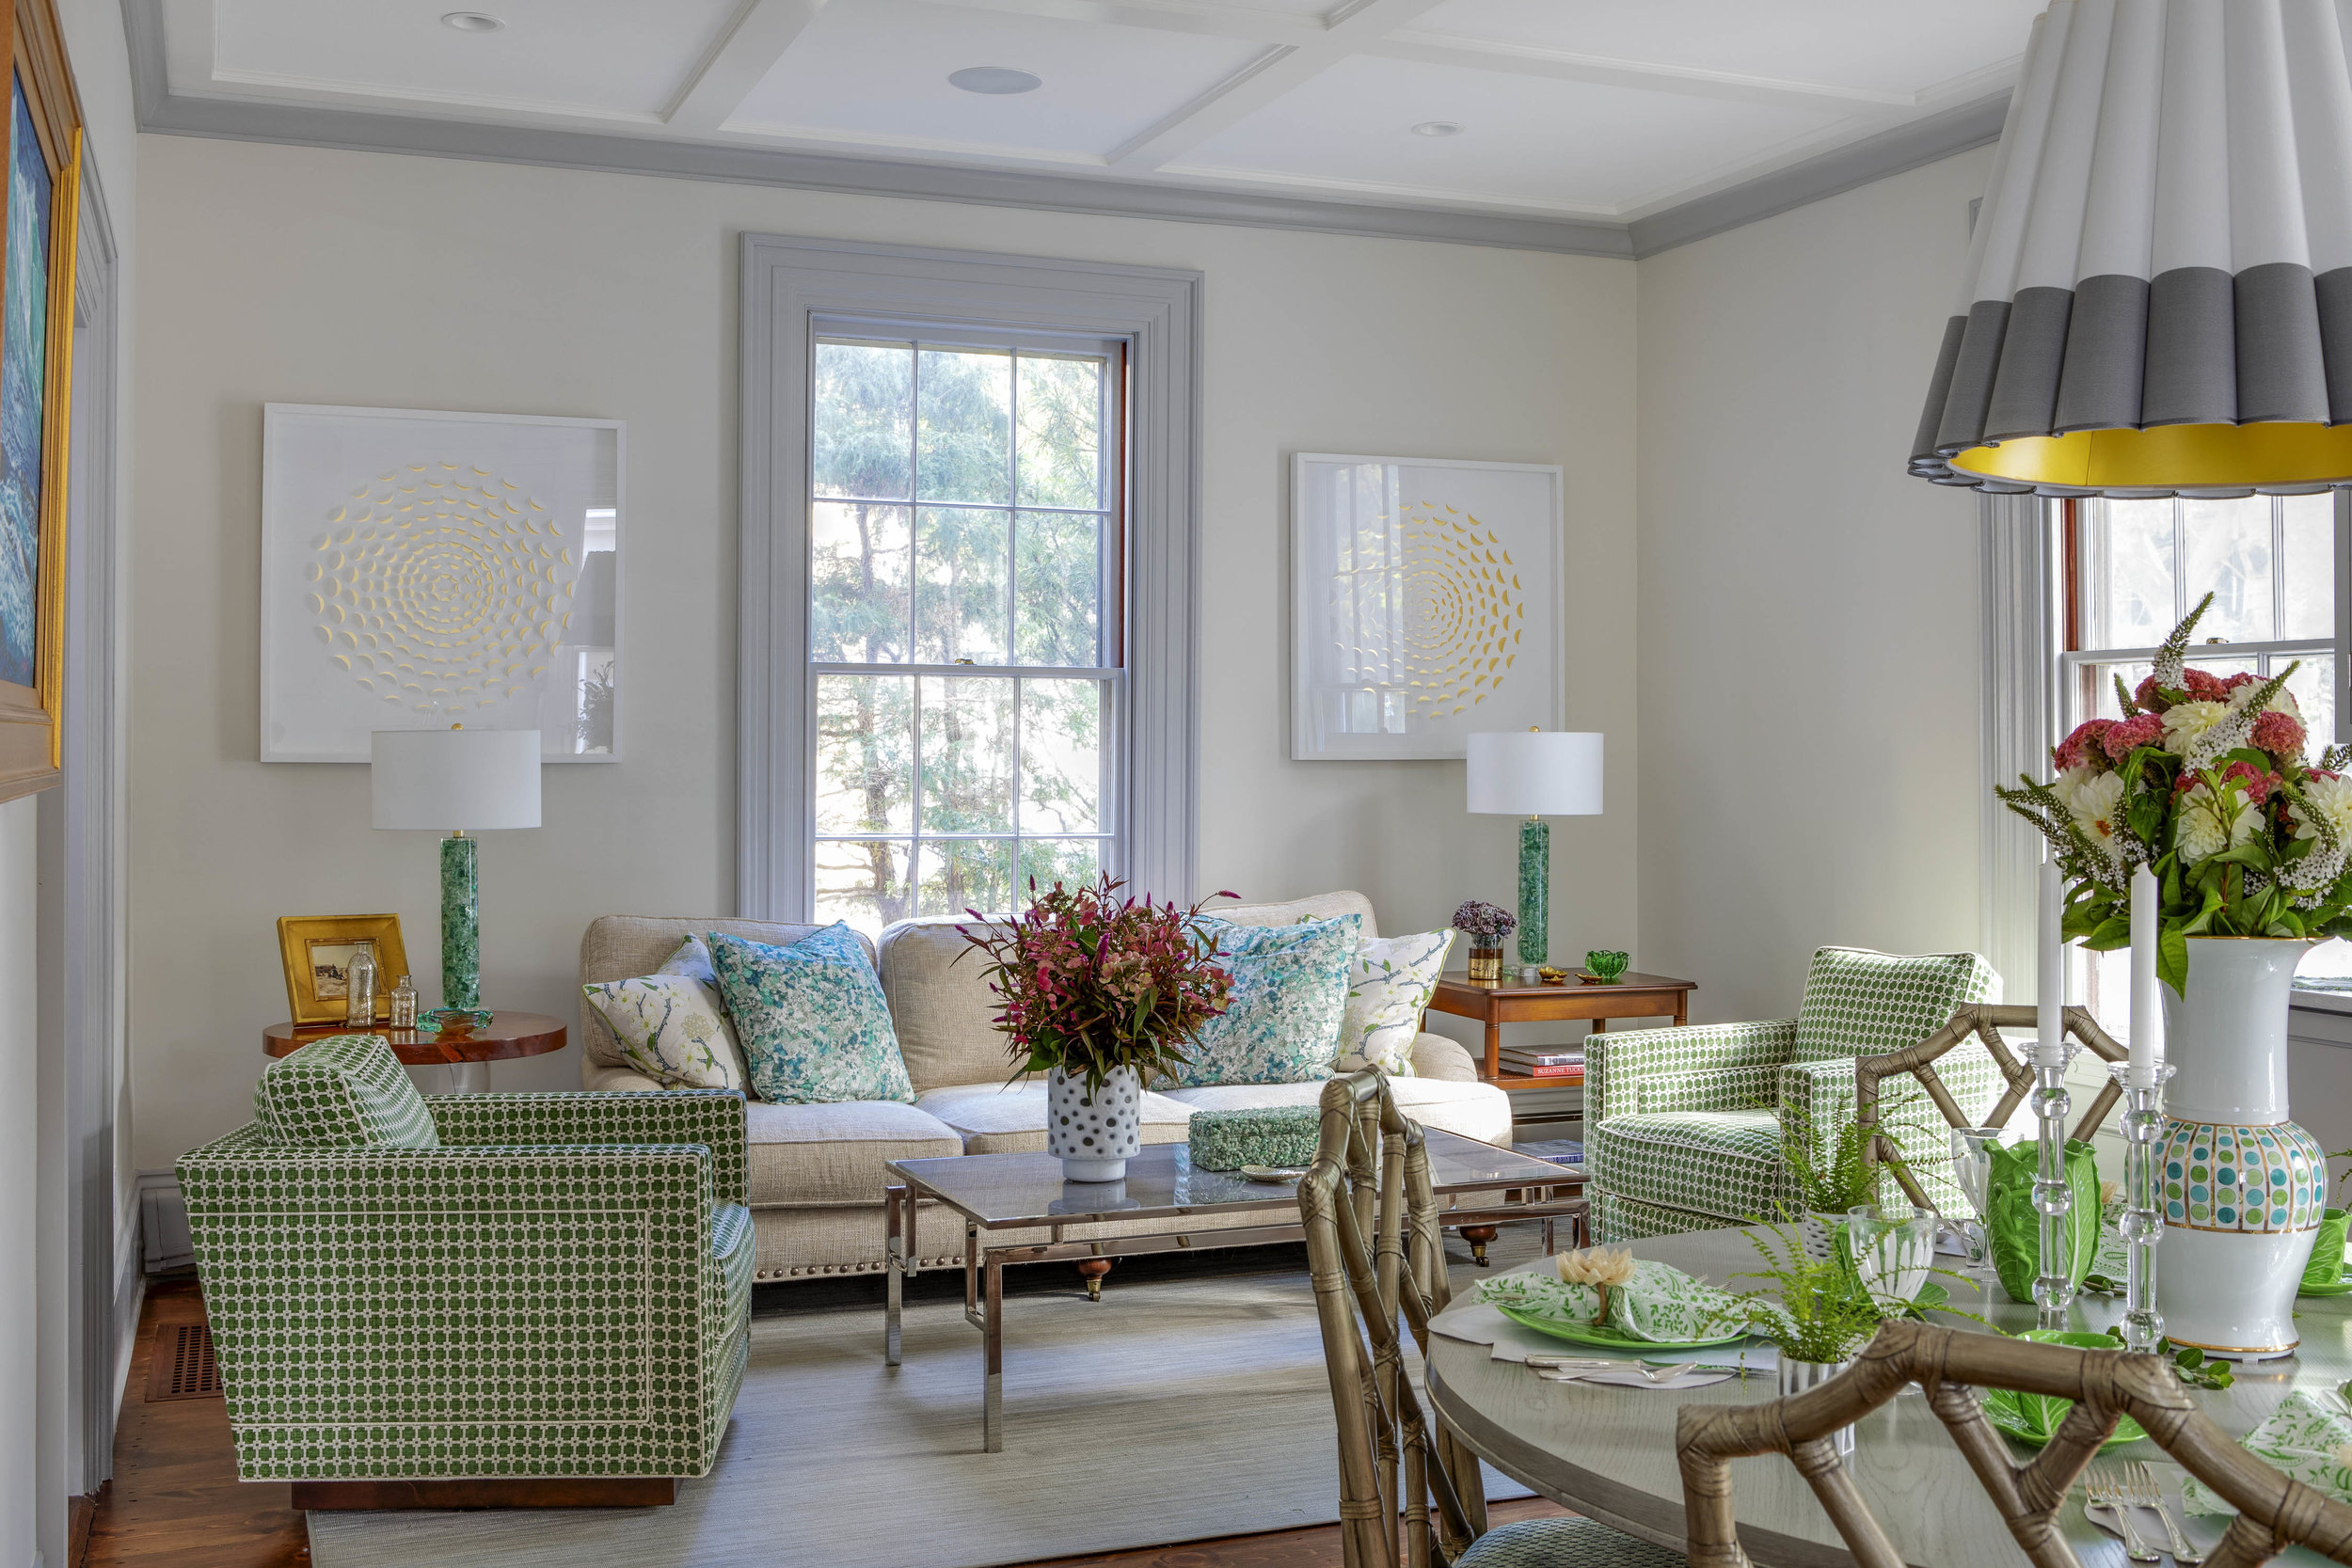 Benefit Street, Providence, Rhode Island, living room, interior design, jocelyn chiappone, digs design, digs interior design, digs design company